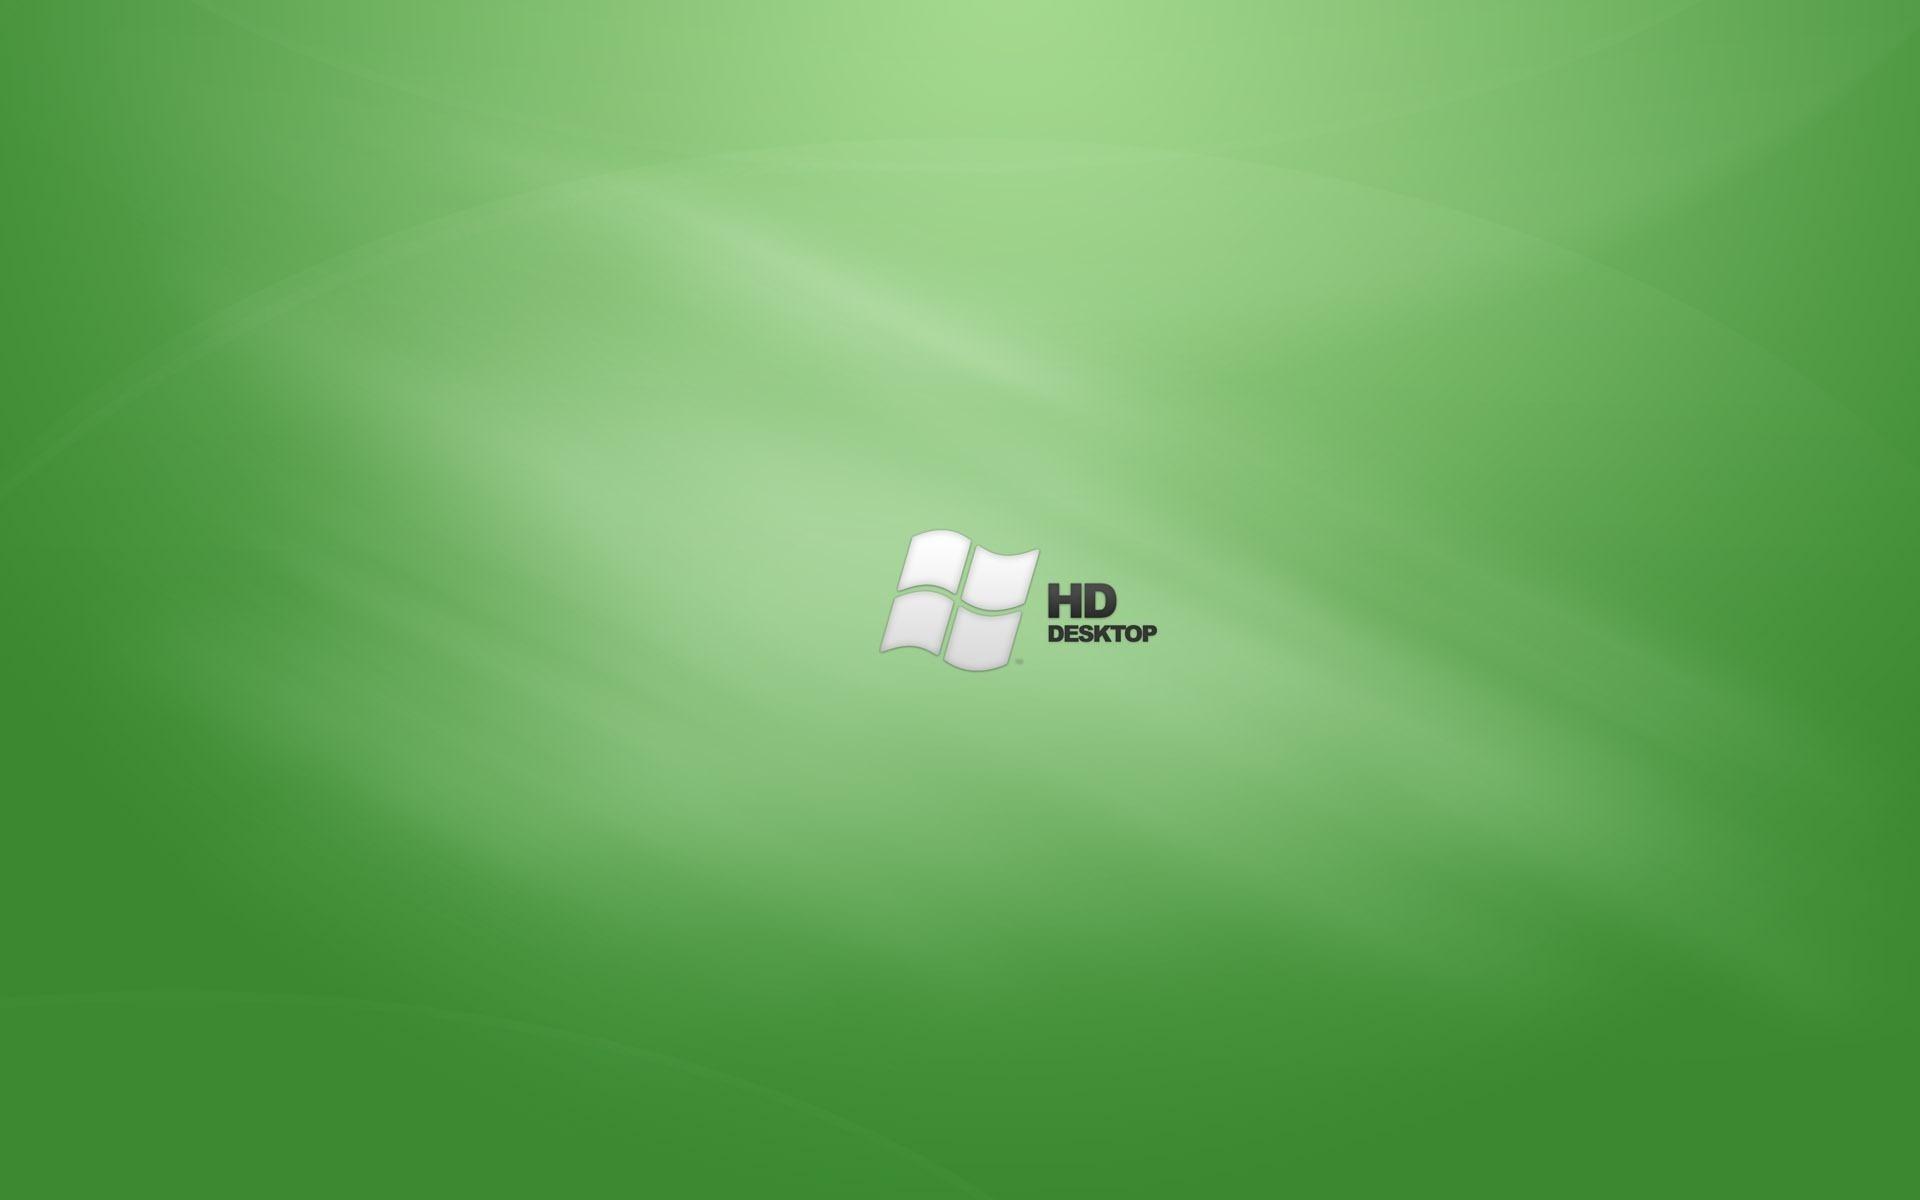 Wallpapers Backgrounds – Microsoft Windows Vista green theme wallpaper  desktop